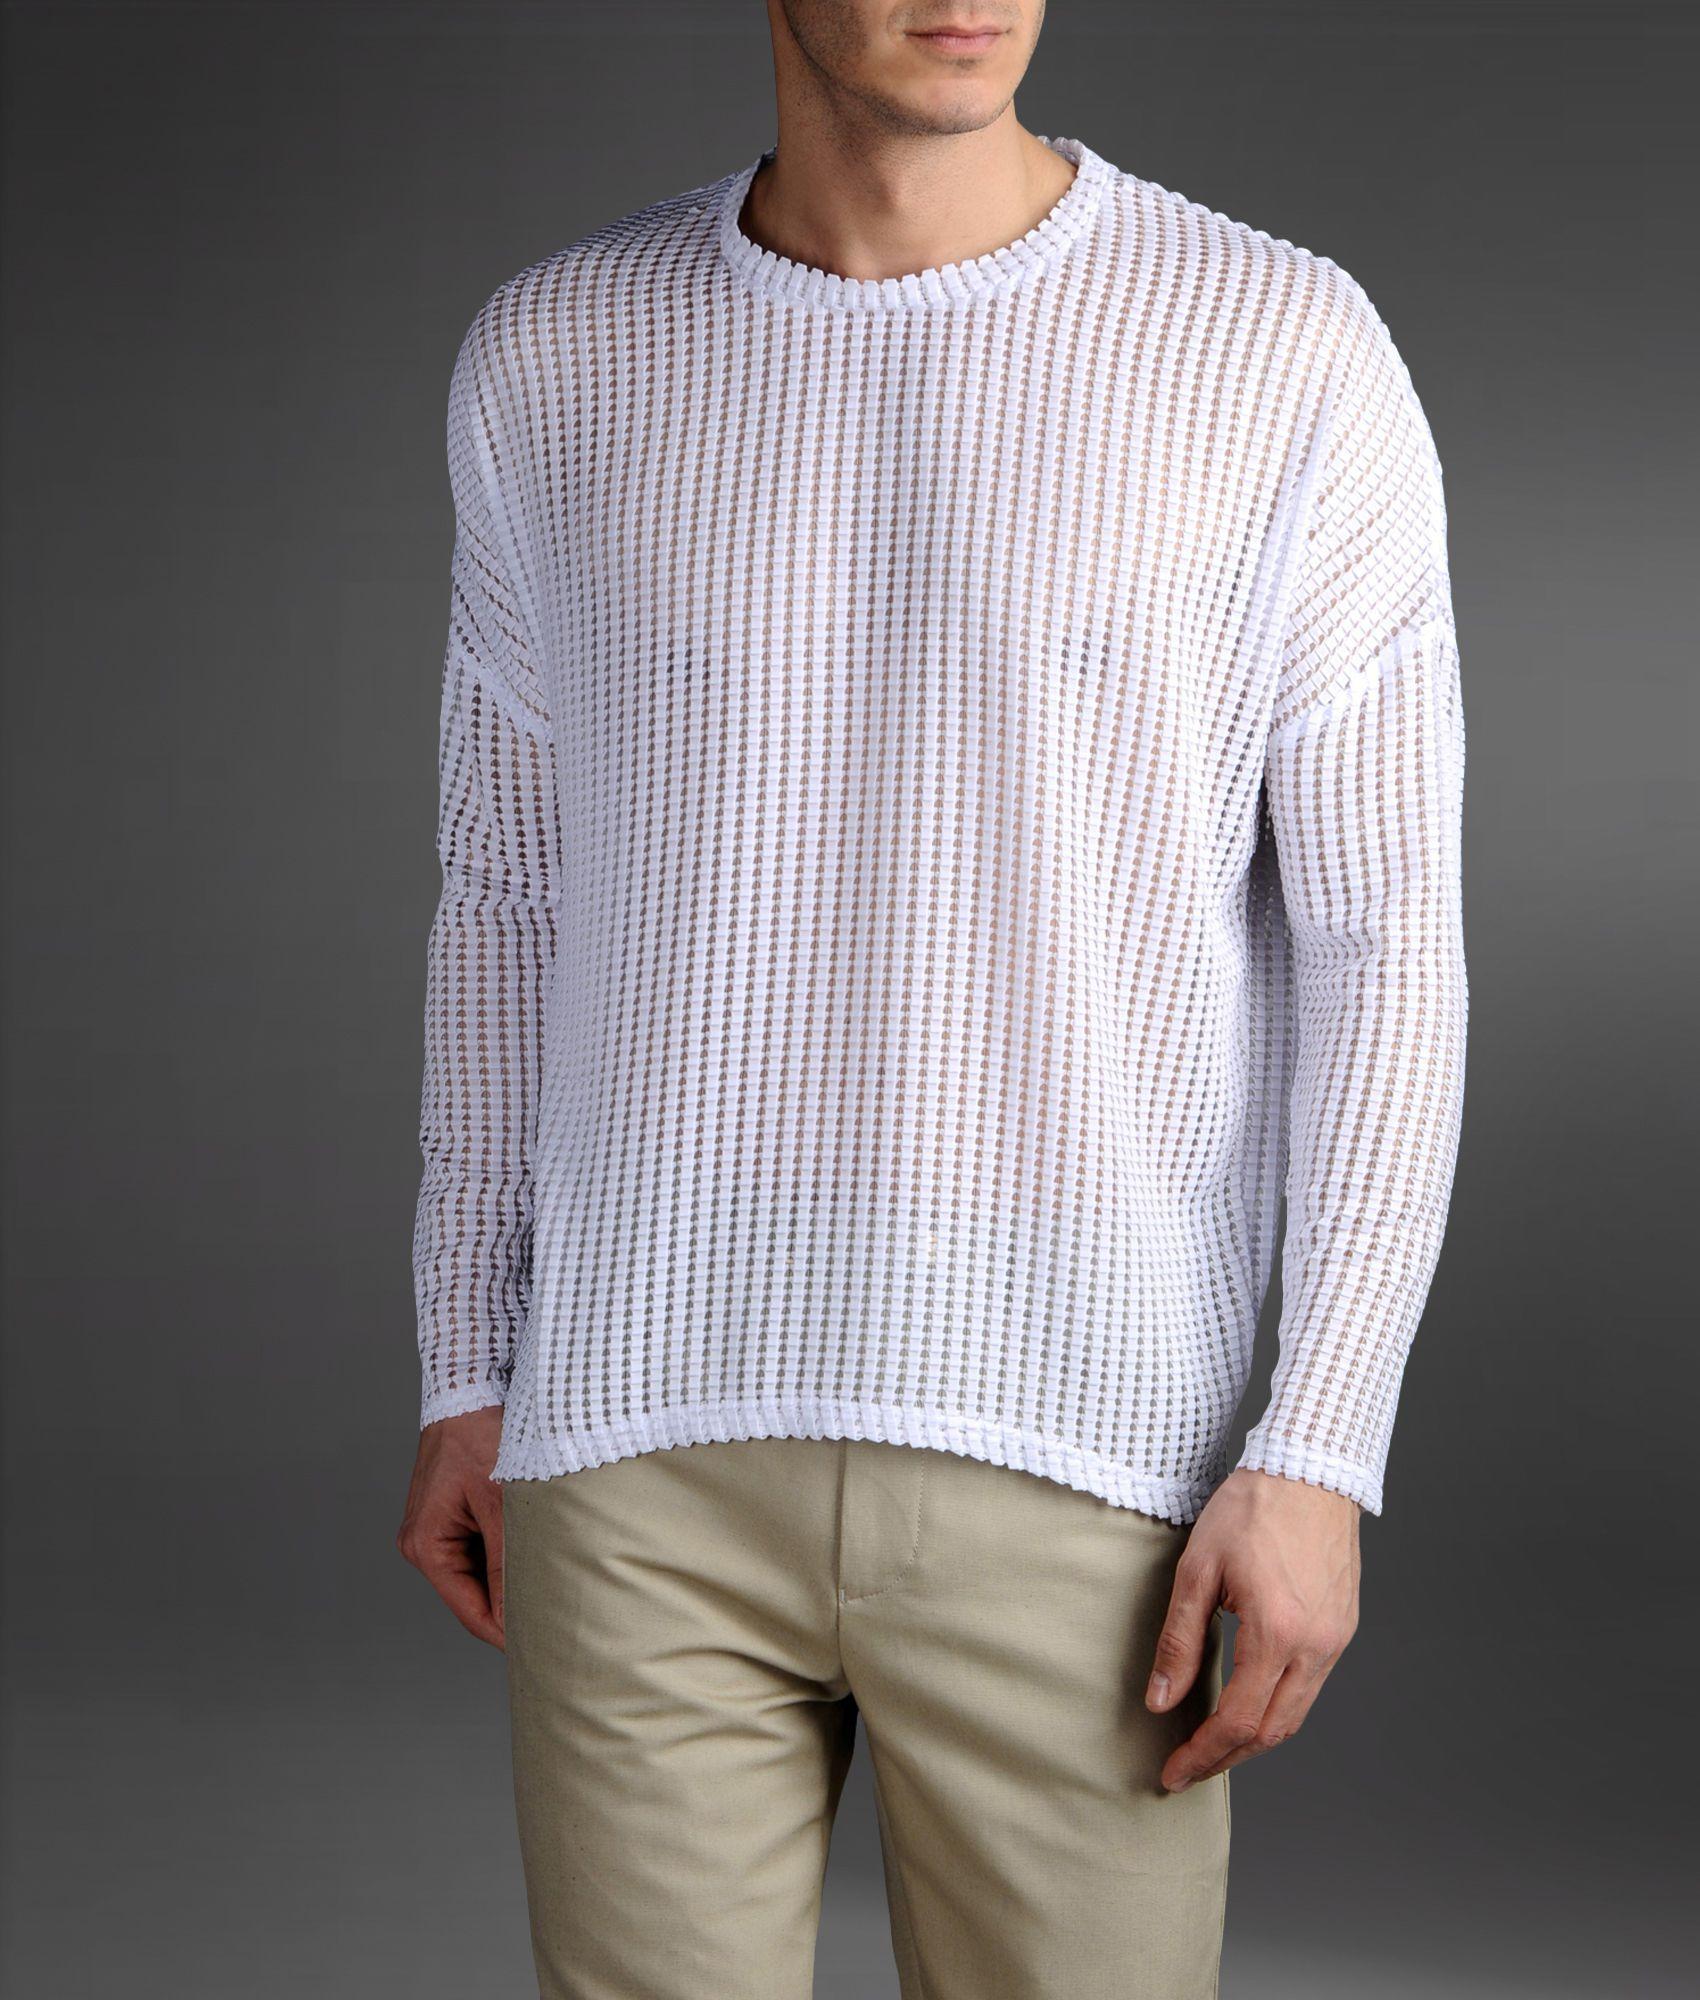 emporio armani origami effect mesh sweater in white for. Black Bedroom Furniture Sets. Home Design Ideas